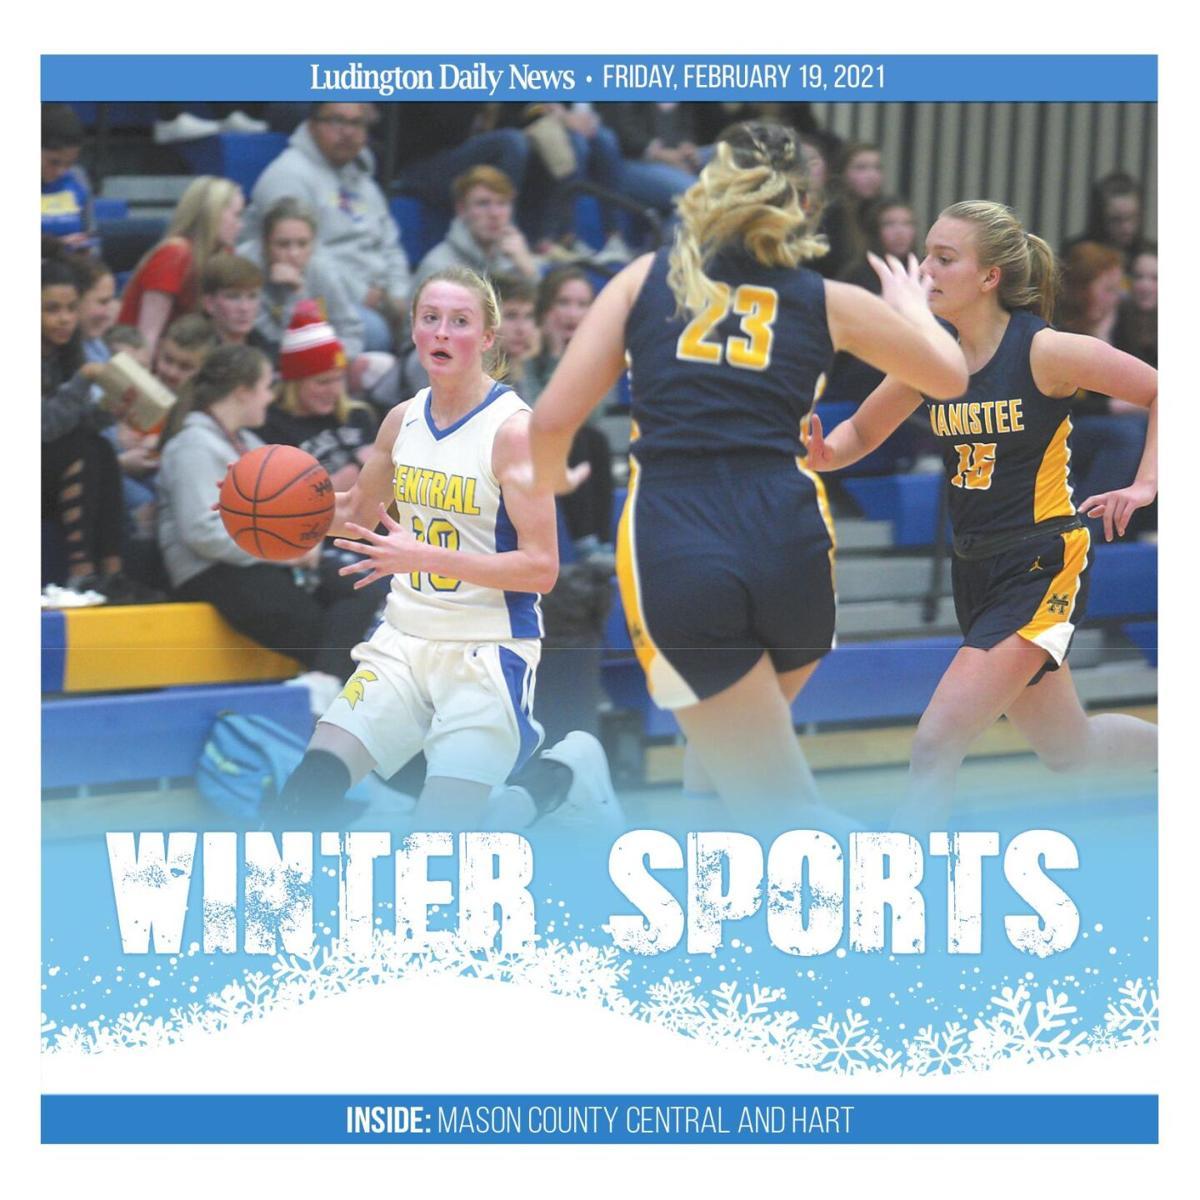 Winter Sports - MCC, Hart